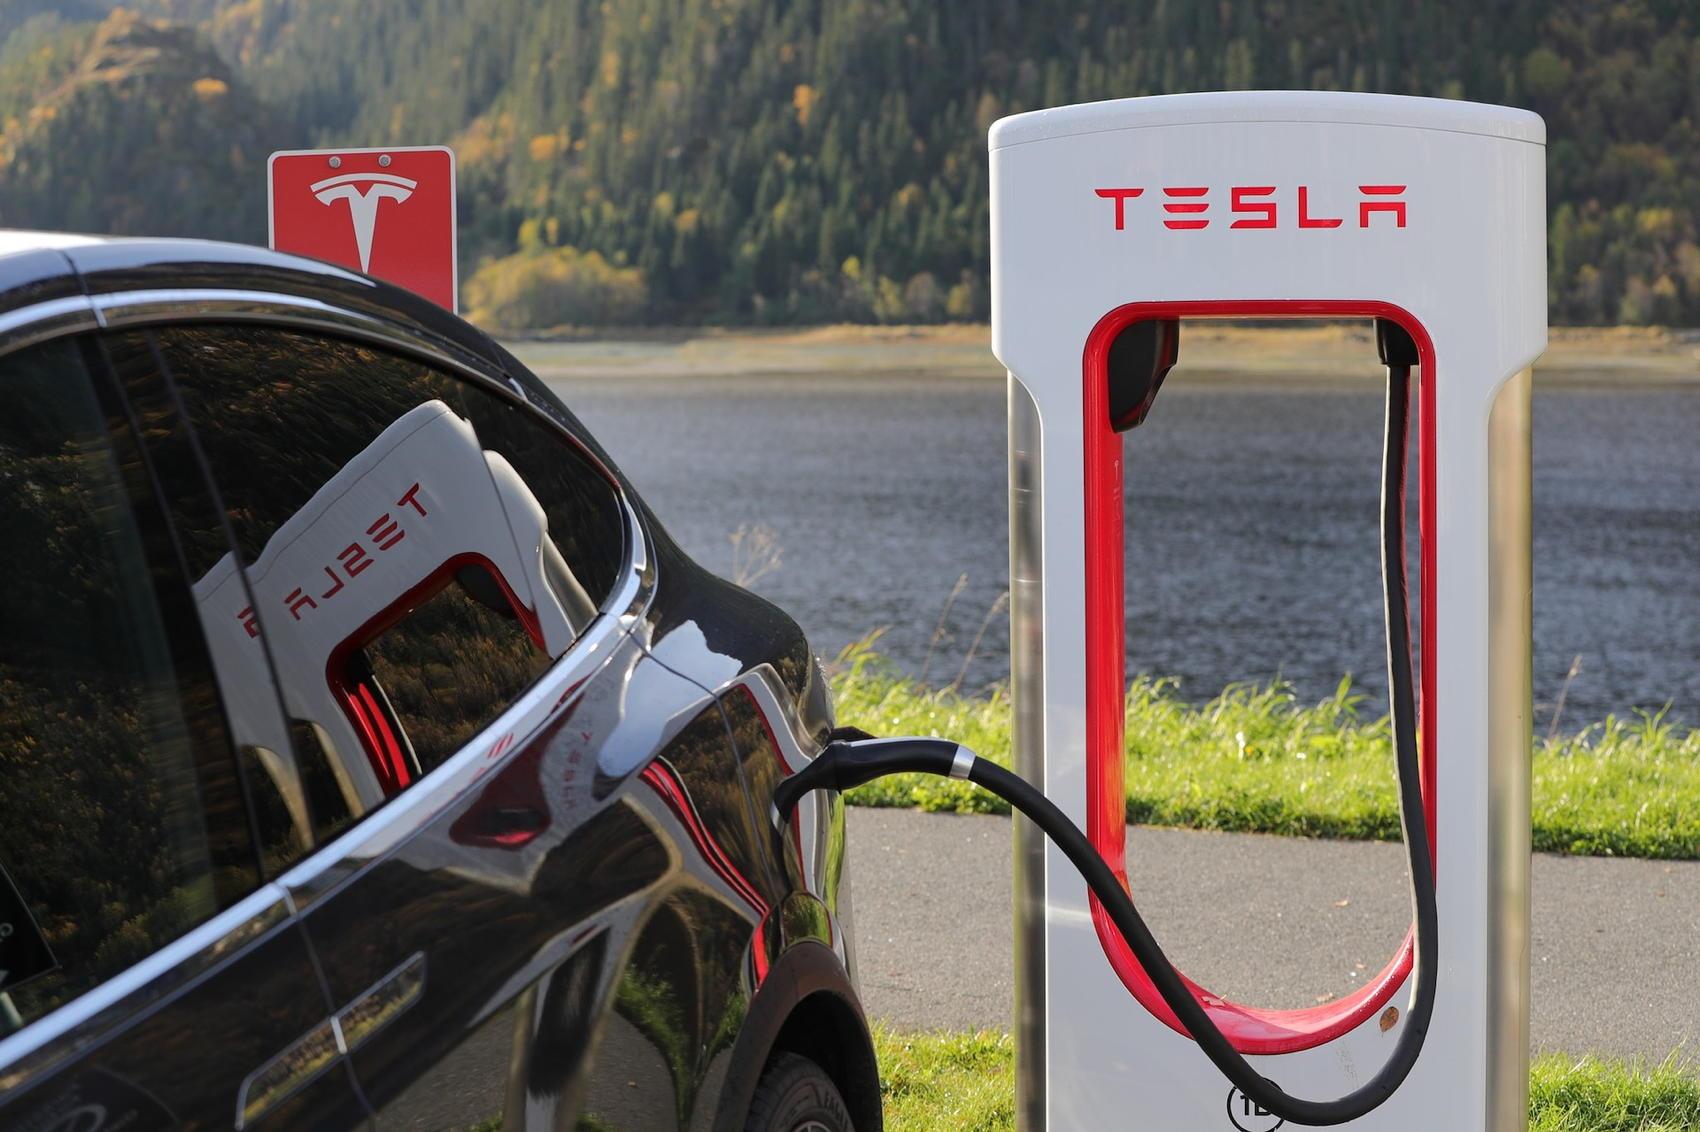 Tesla Charging - Image by Blomst